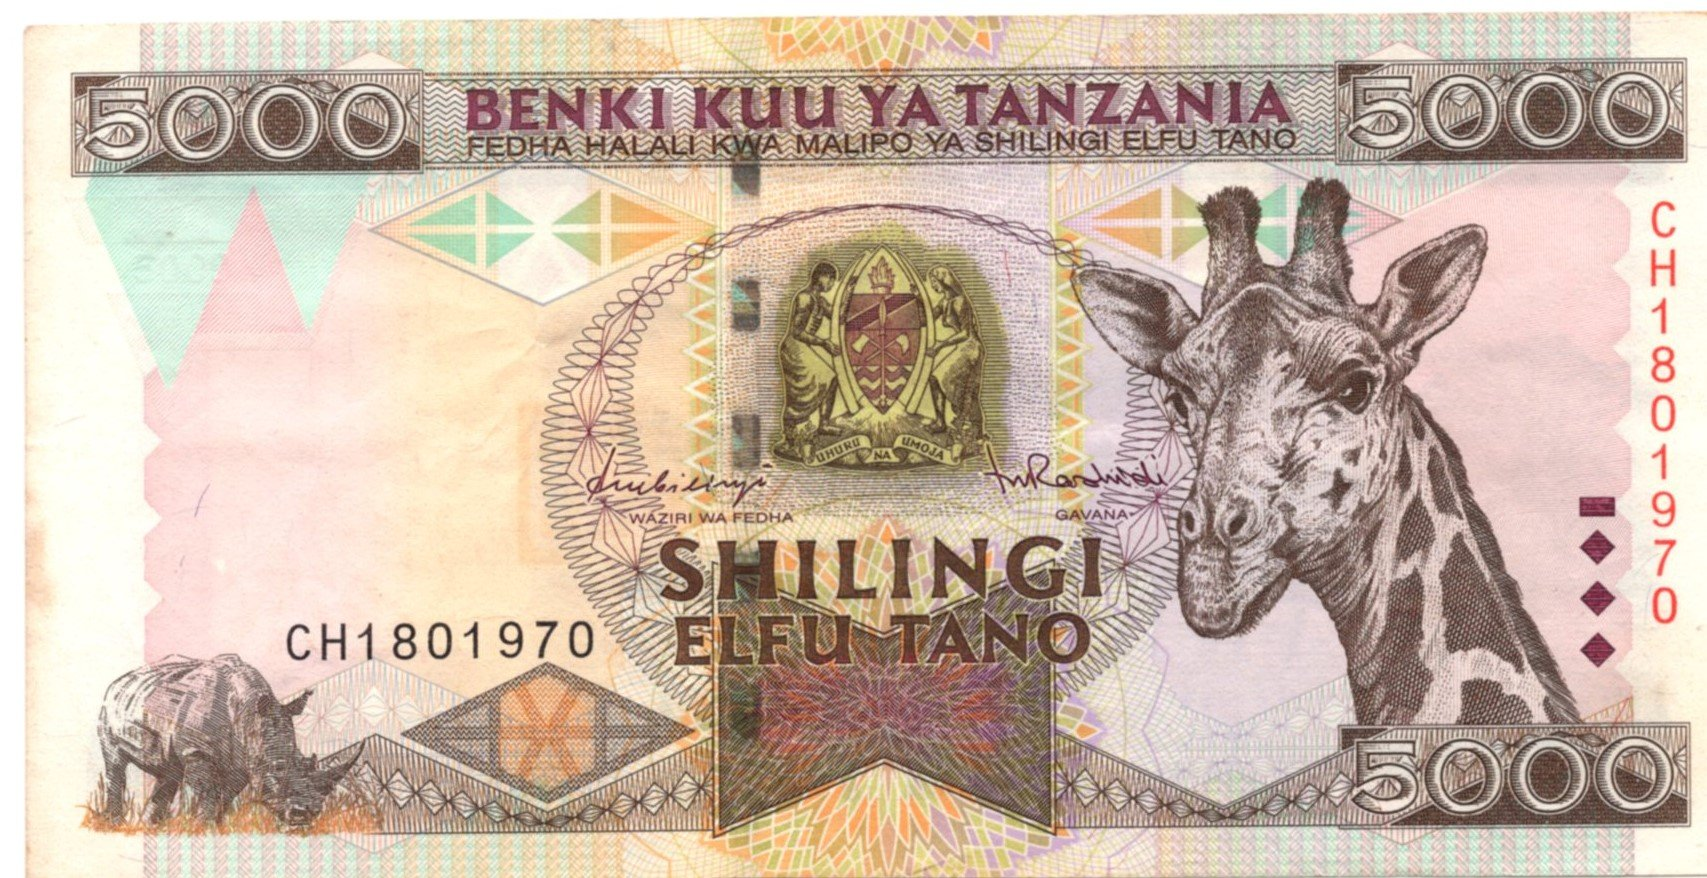 tanzania 5000 shillings